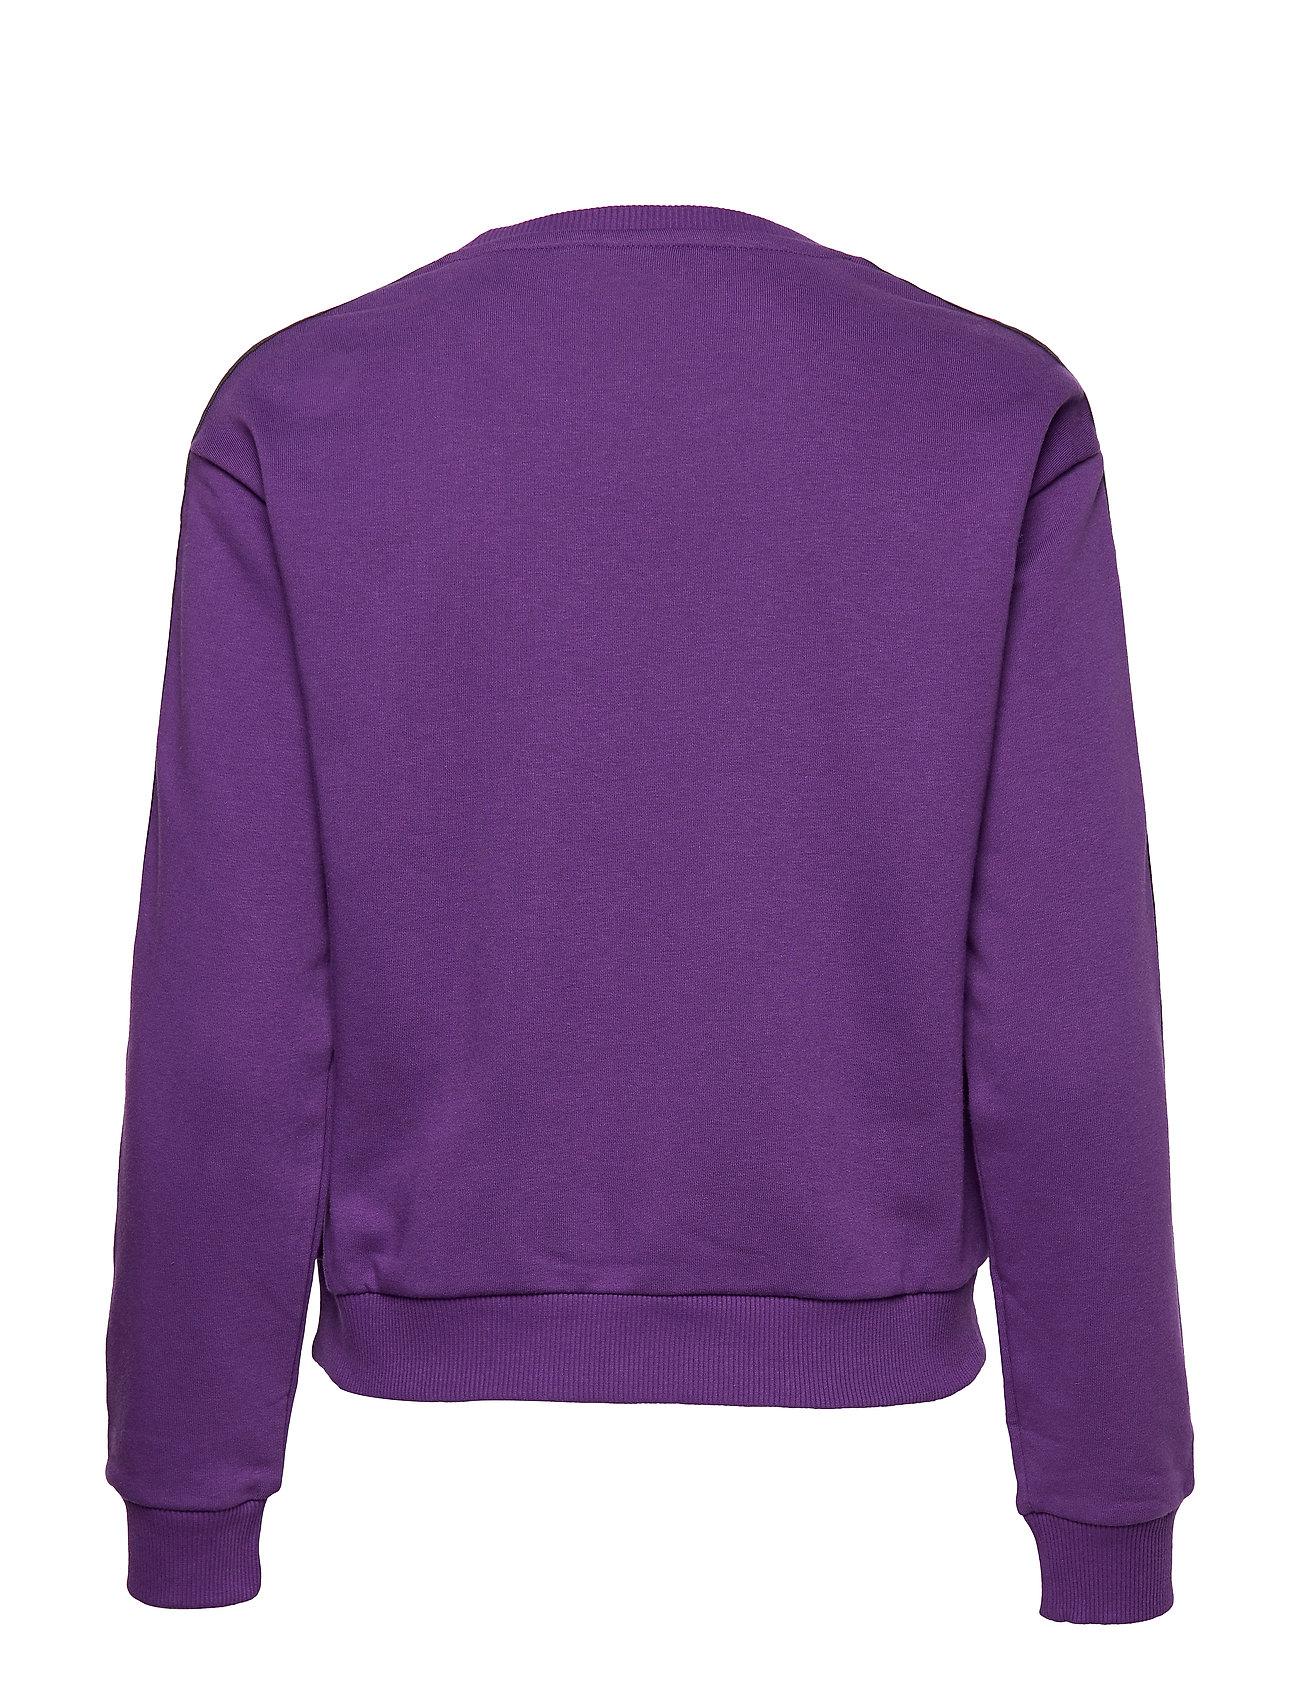 FILA    WOMEN TIVKA crew sweat  - Sweatshirts    BLACK